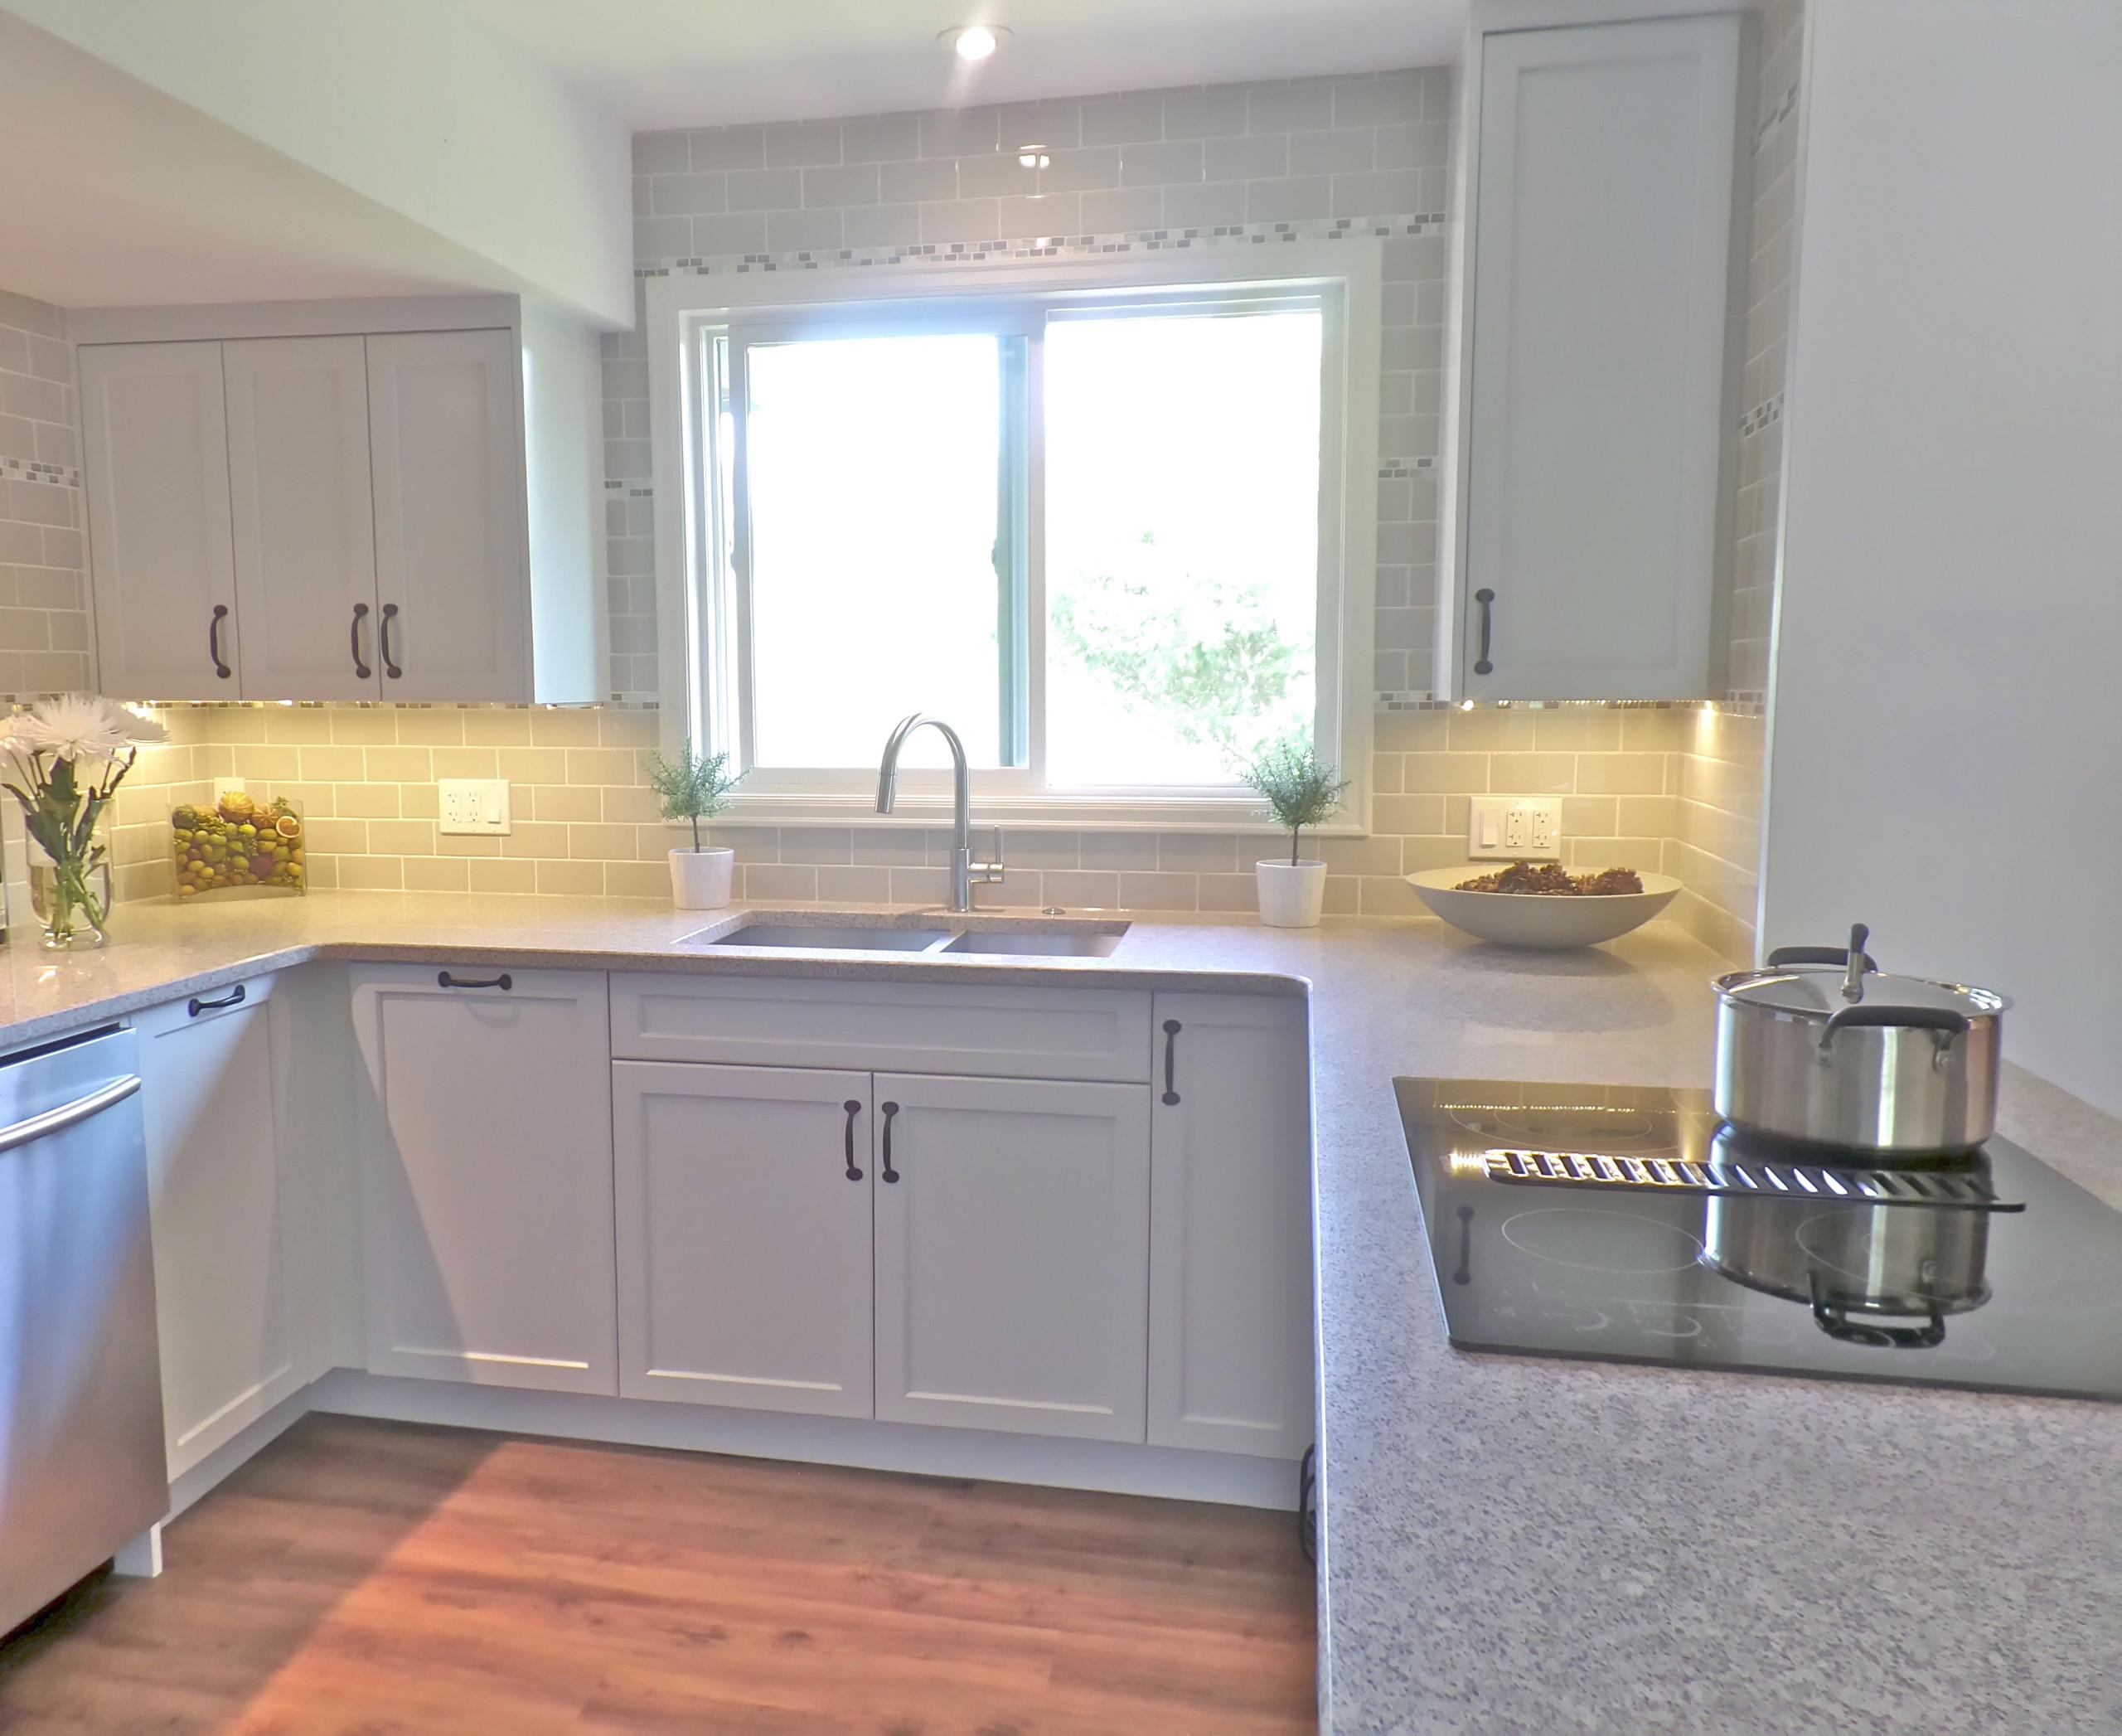 Updated U-Shaped Kitchen